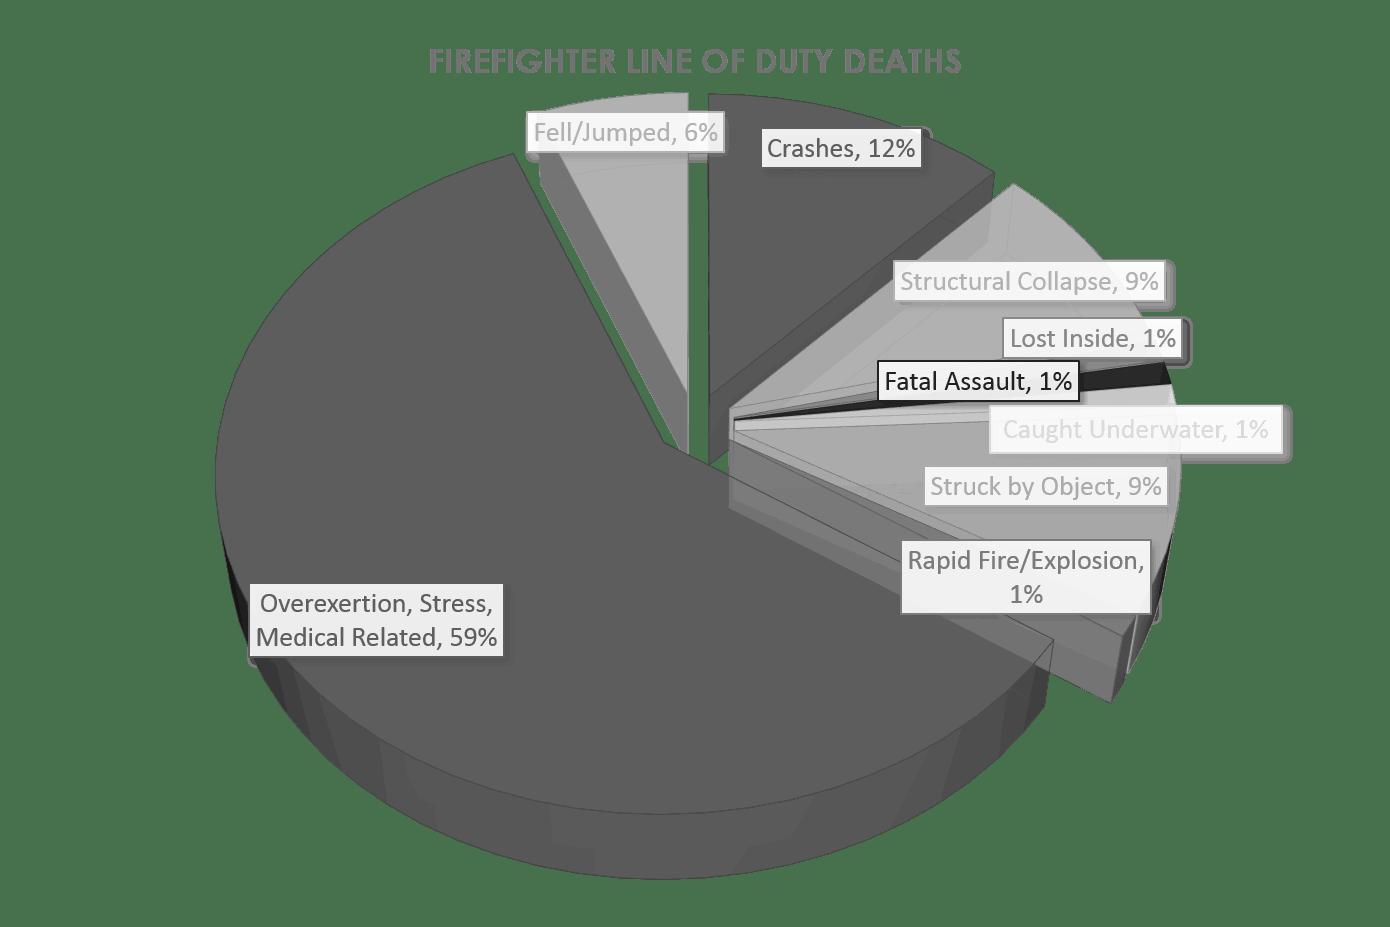 hight resolution of fahy rita f u s firefighter injuries 2014 nfpa nfpa